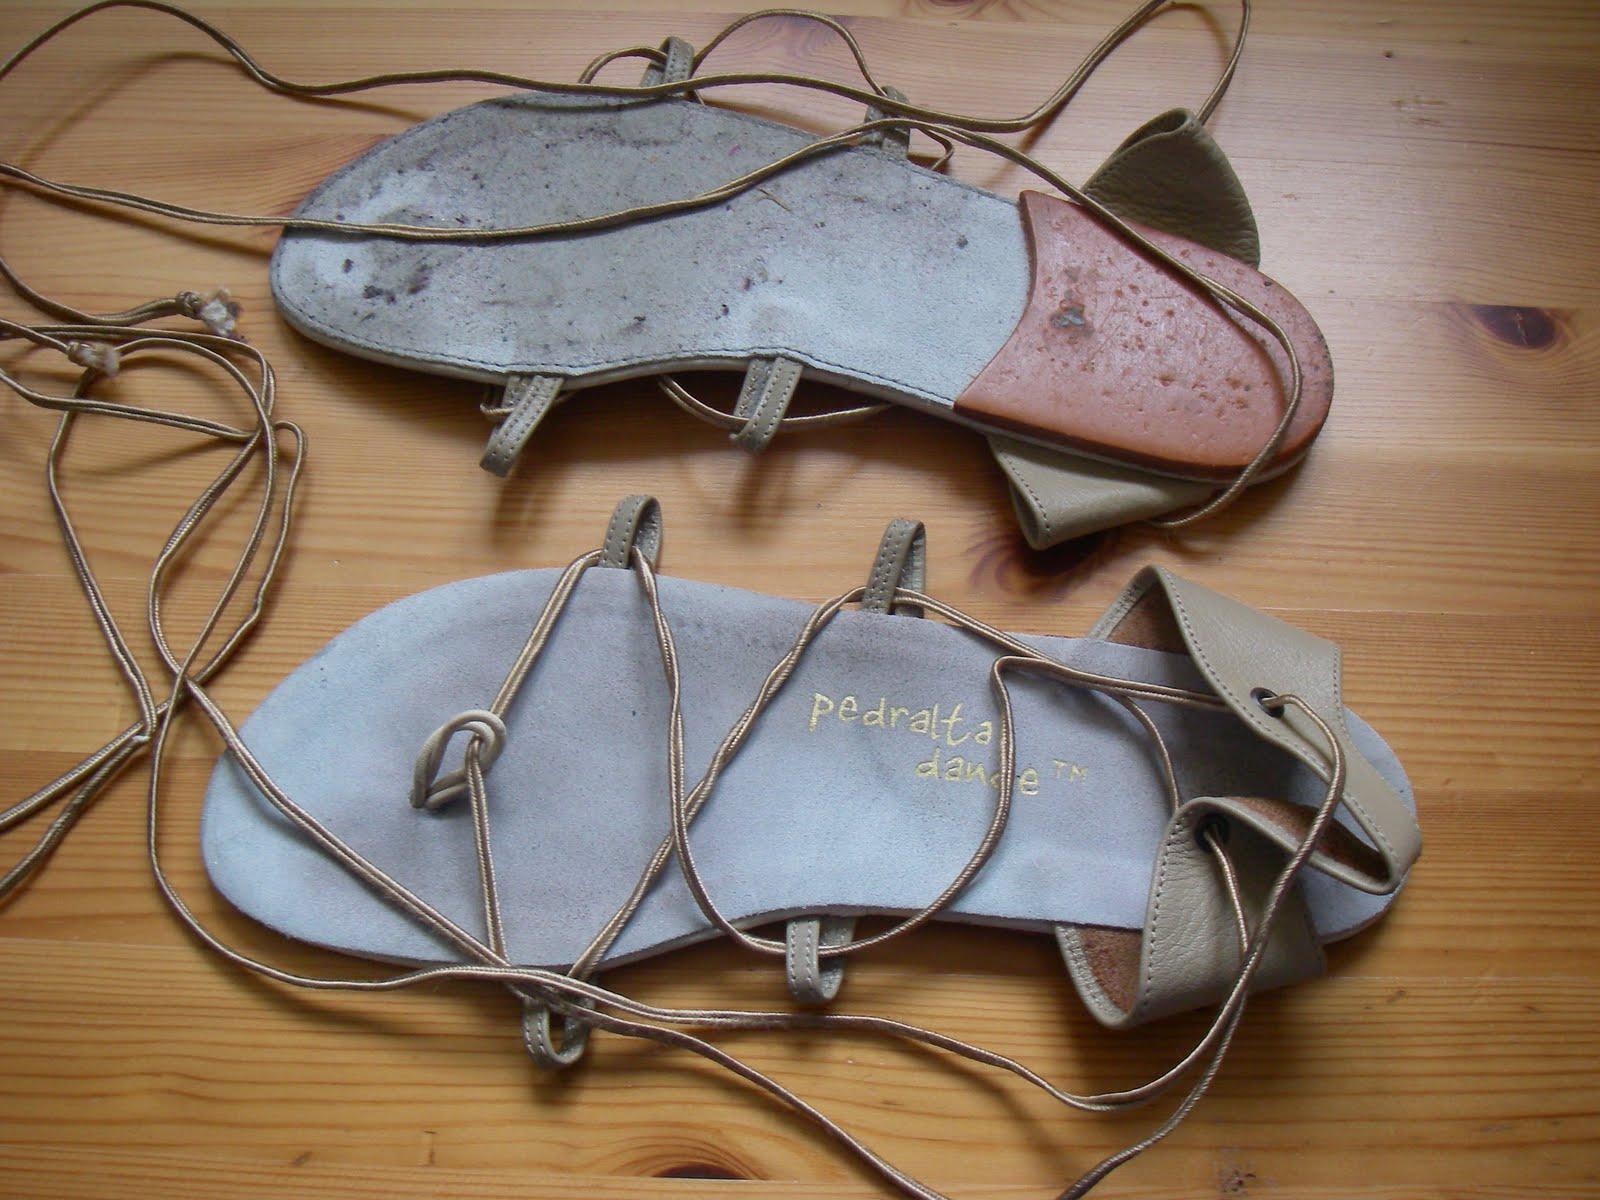 Hermes sandals dance shoes - Hermes Sandals